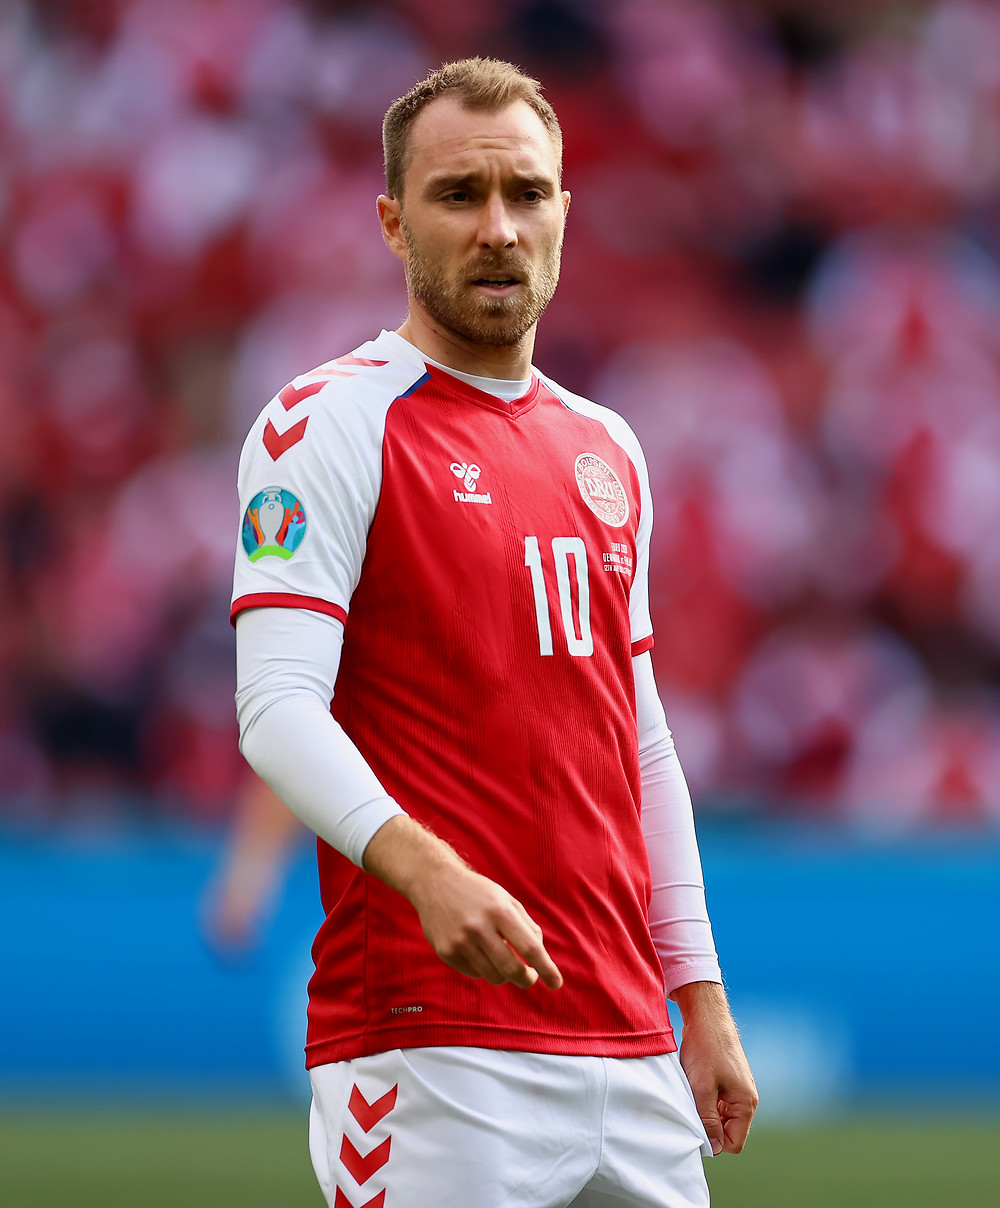 Christian Eriksen © Euro 2020